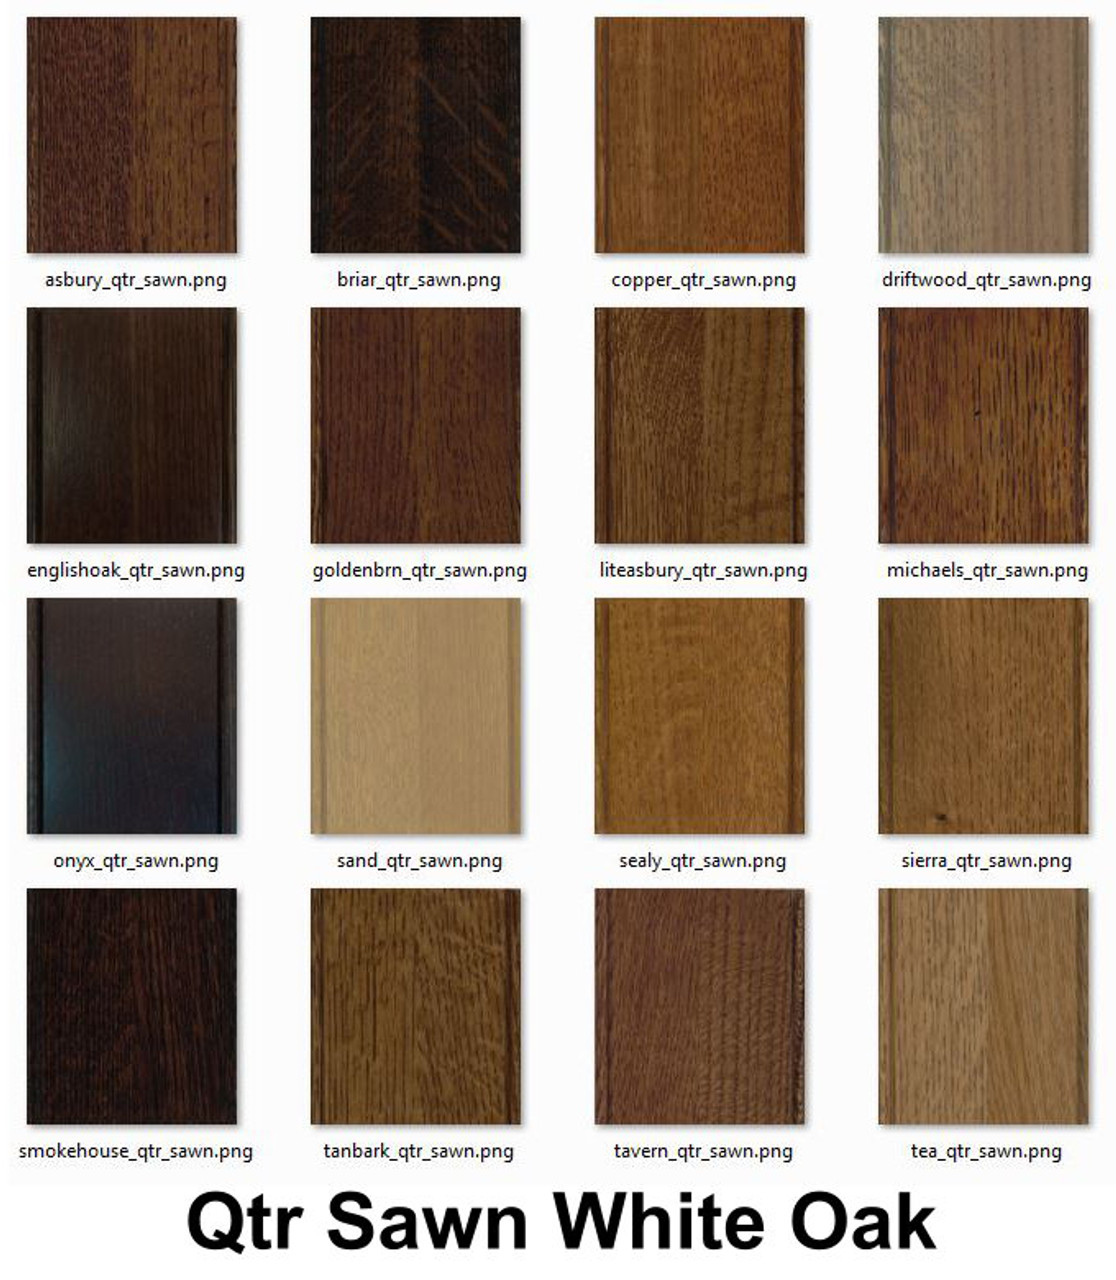 Quartersawn White Oak Wood Samples